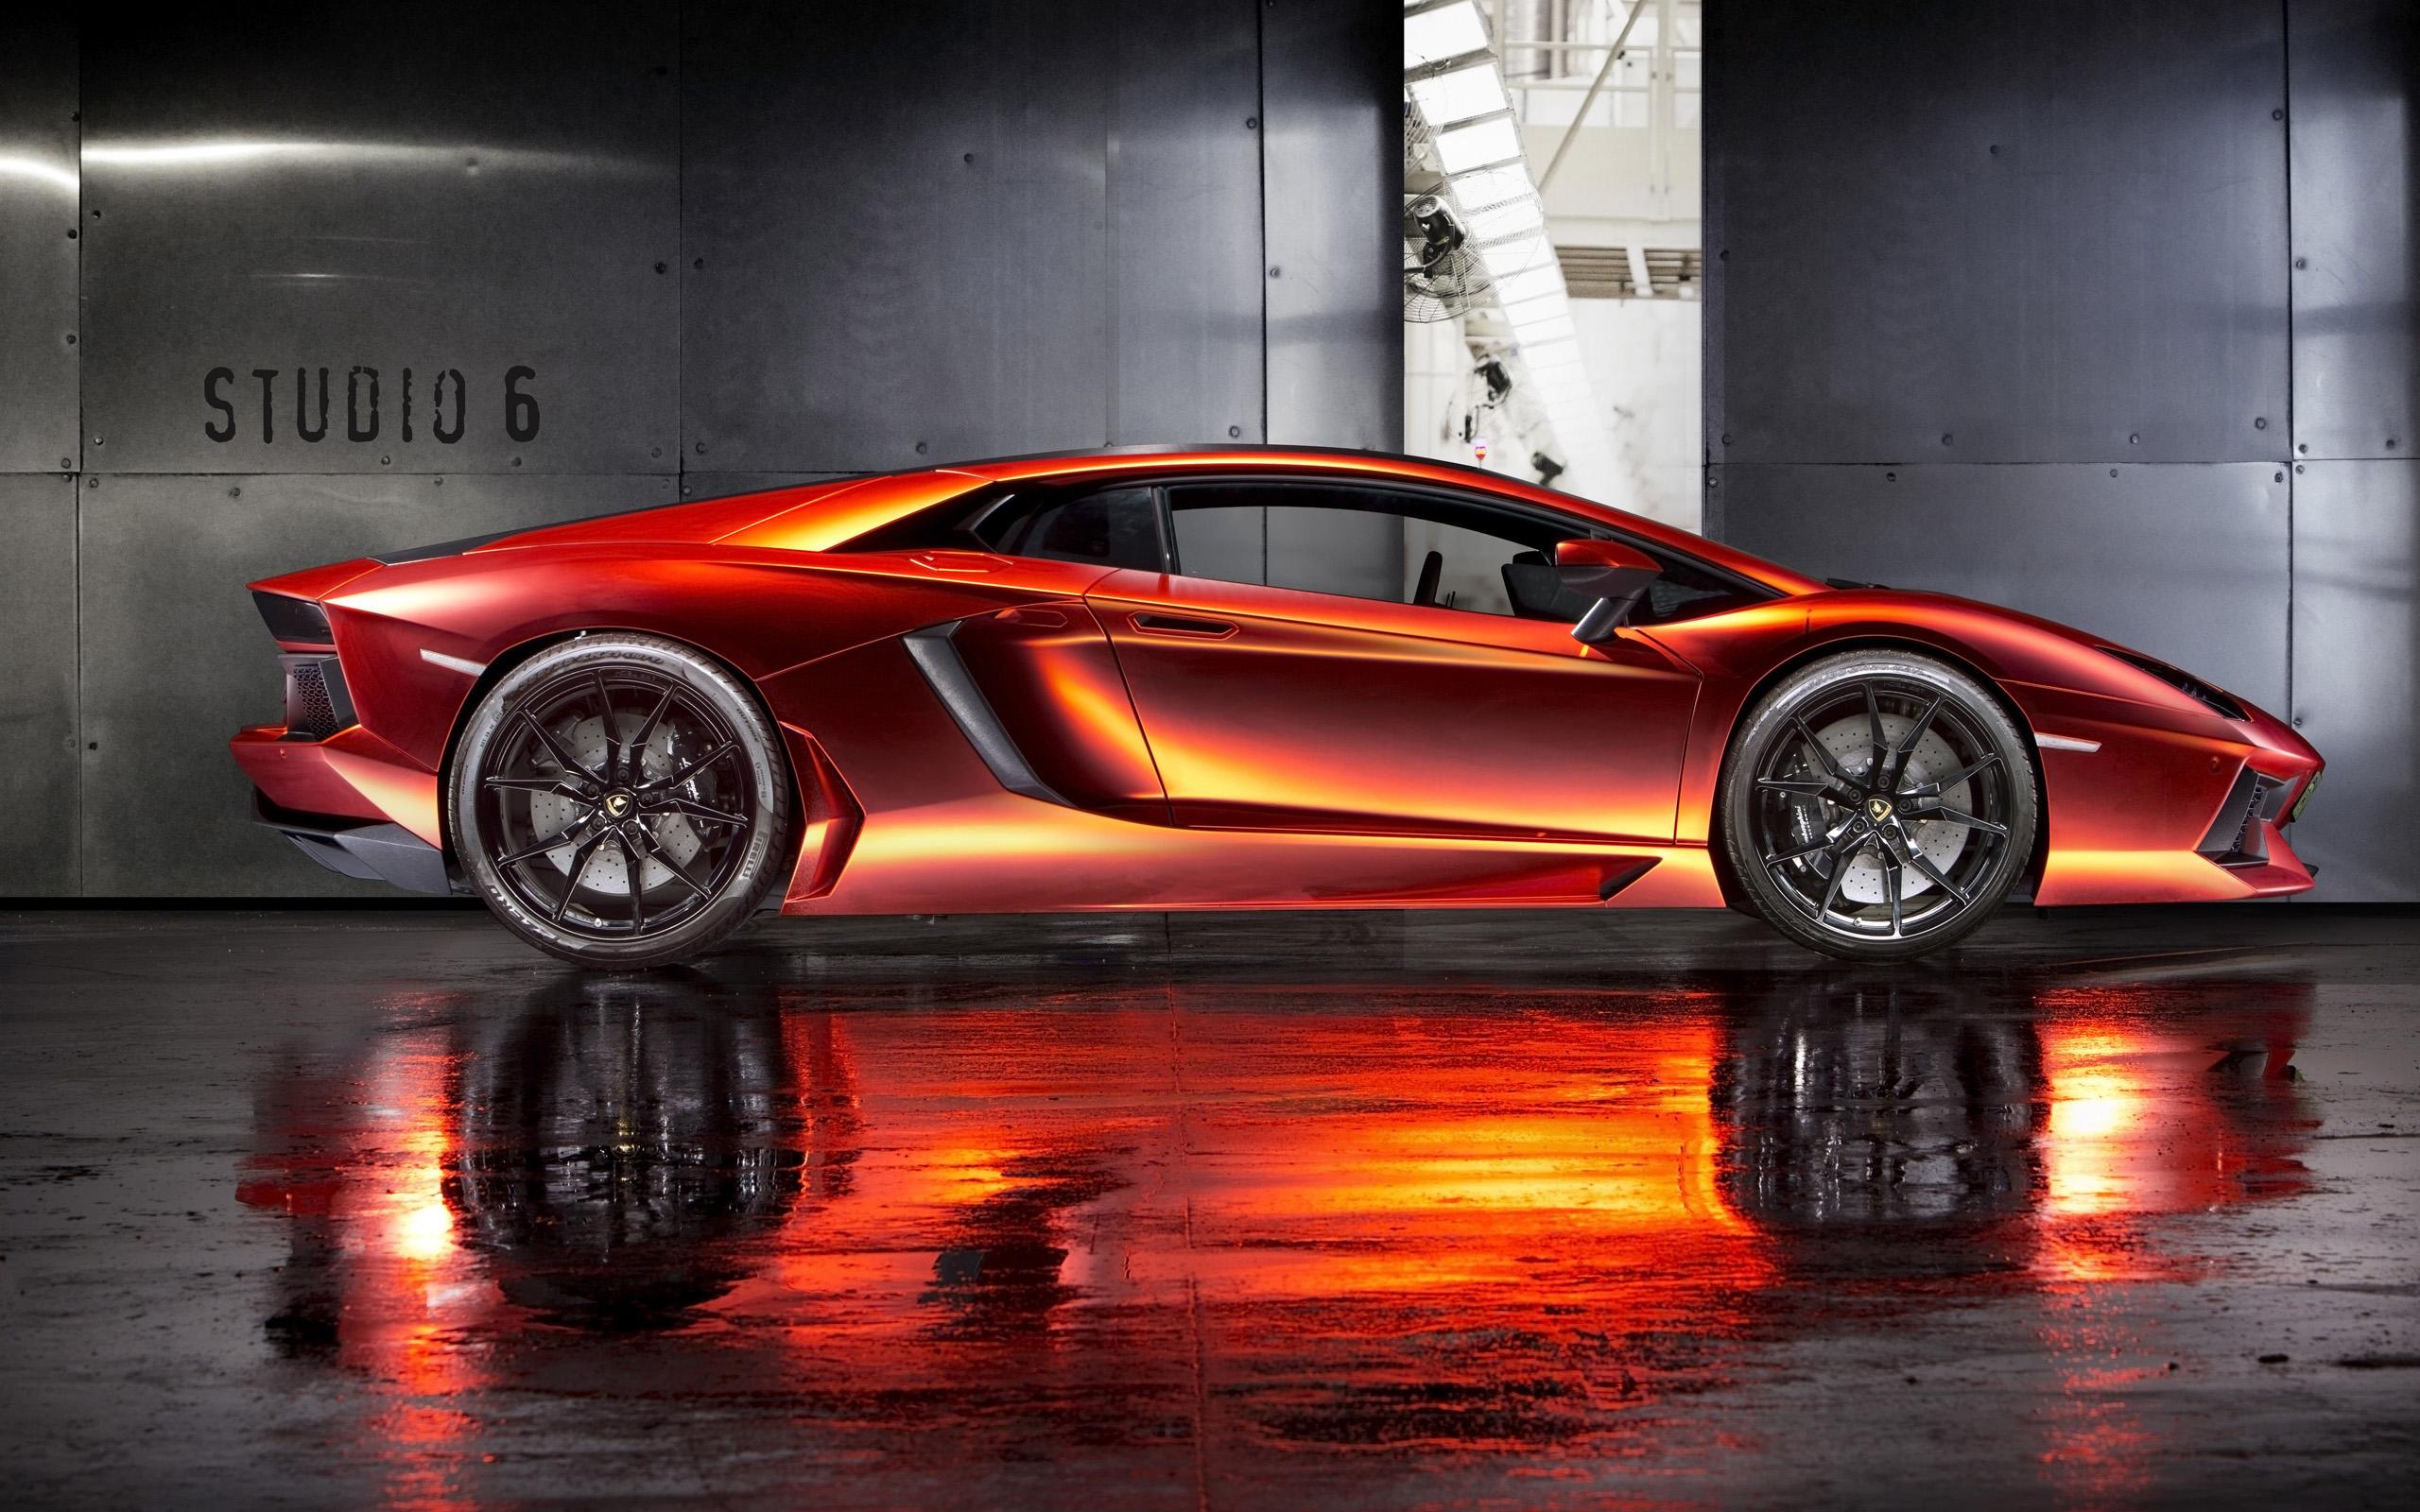 2013 lamborghini aventador by print tech 3 - Tron Lamborghini Aventador Wallpaper